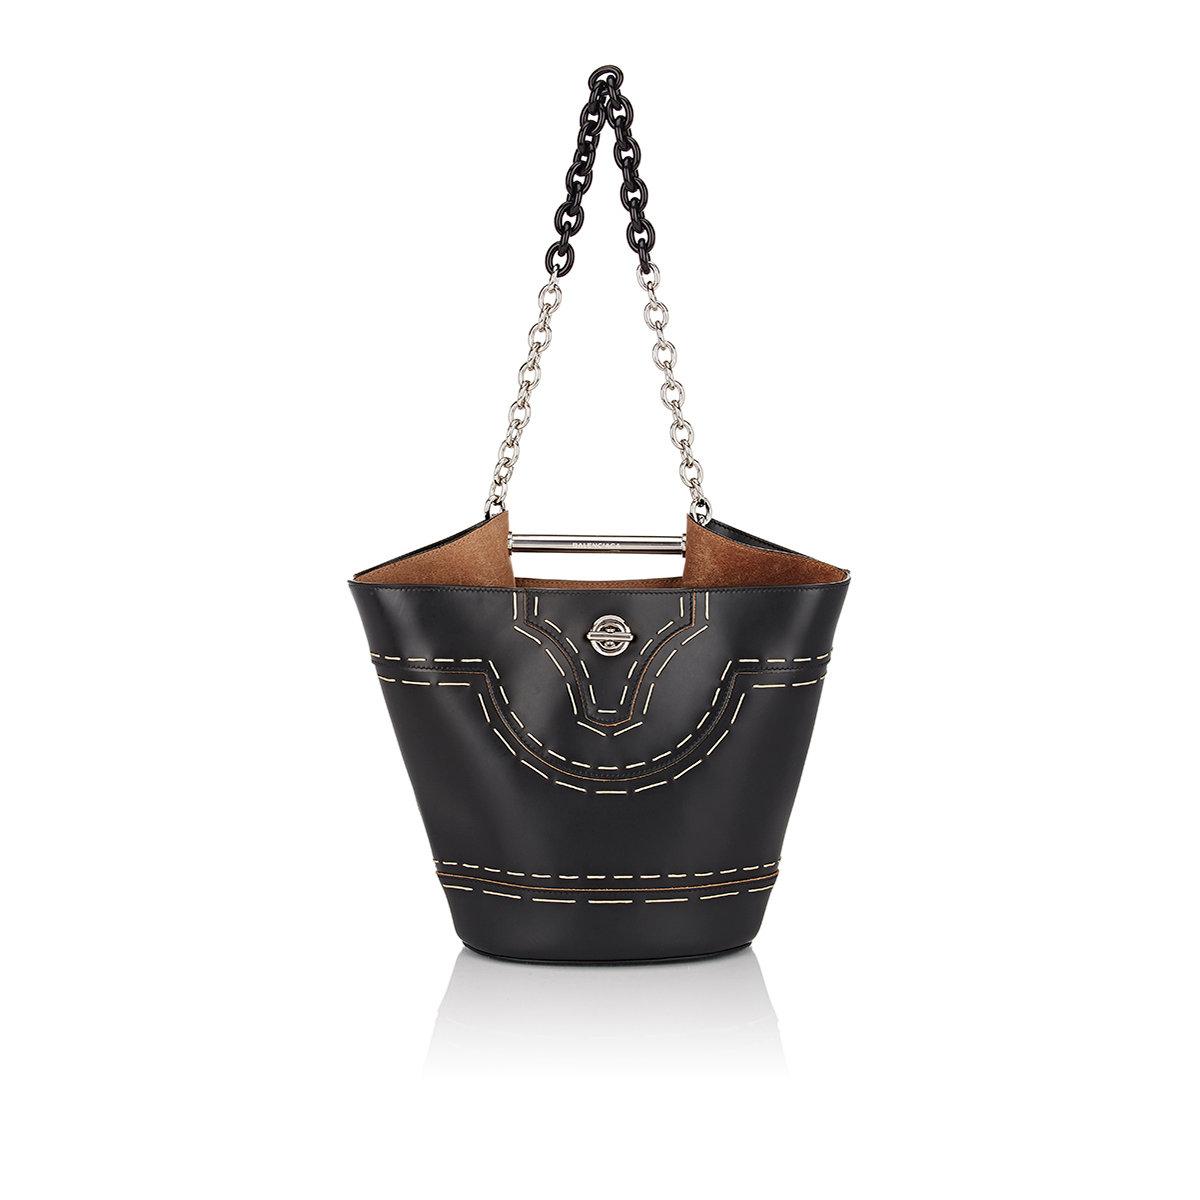 ba54d8f5d Lyst - Balenciaga Mini Bucket Bag in Black